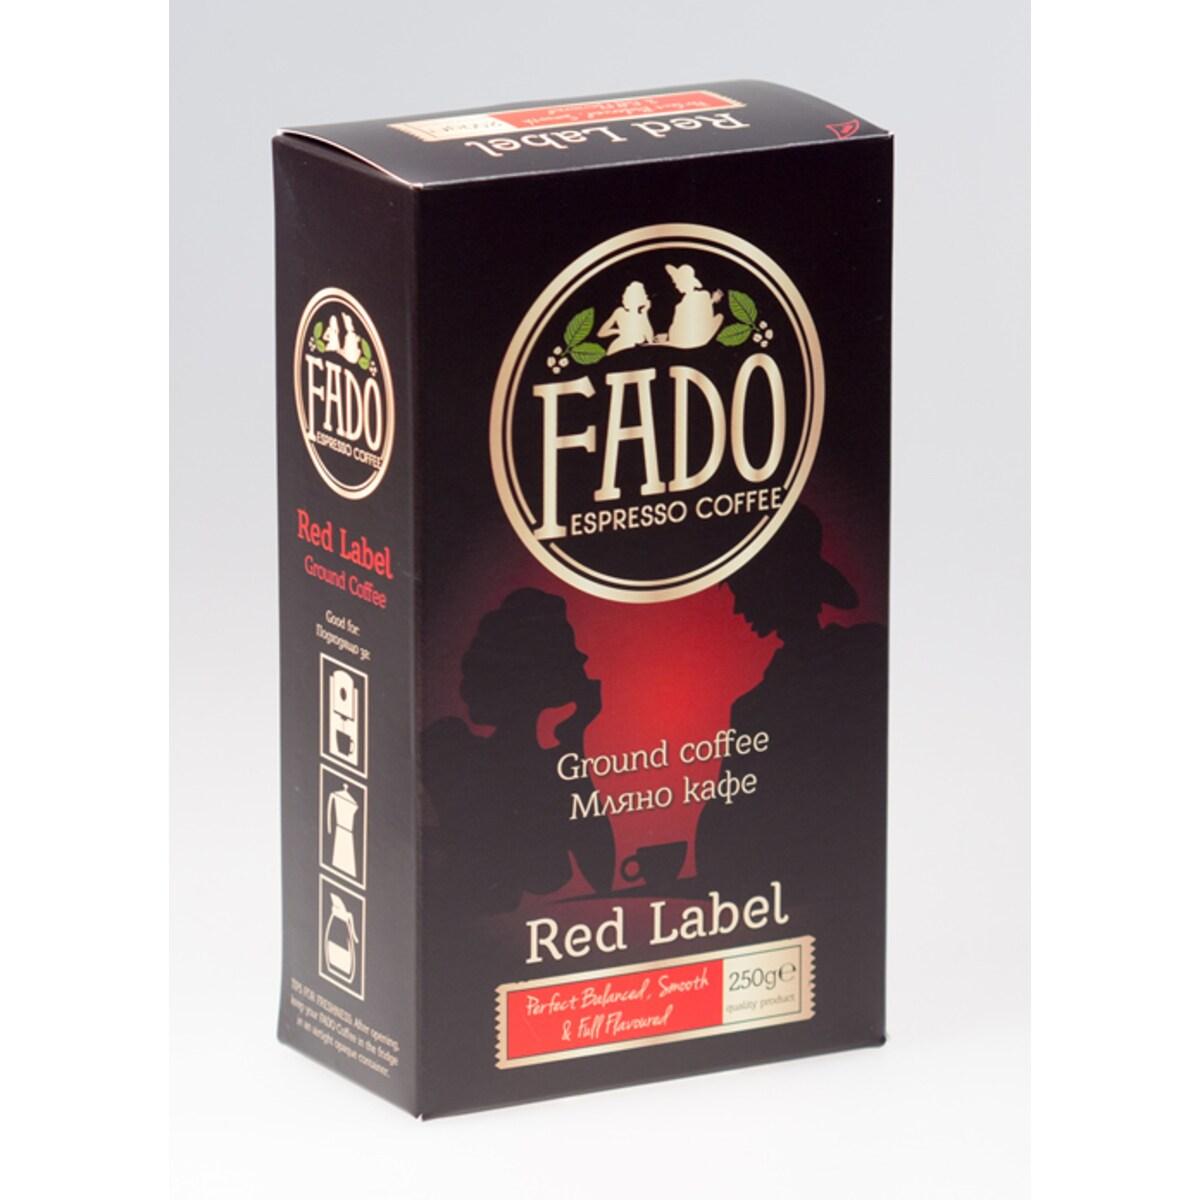 Fado Red Label espresso coffee мляно кафе 250гр